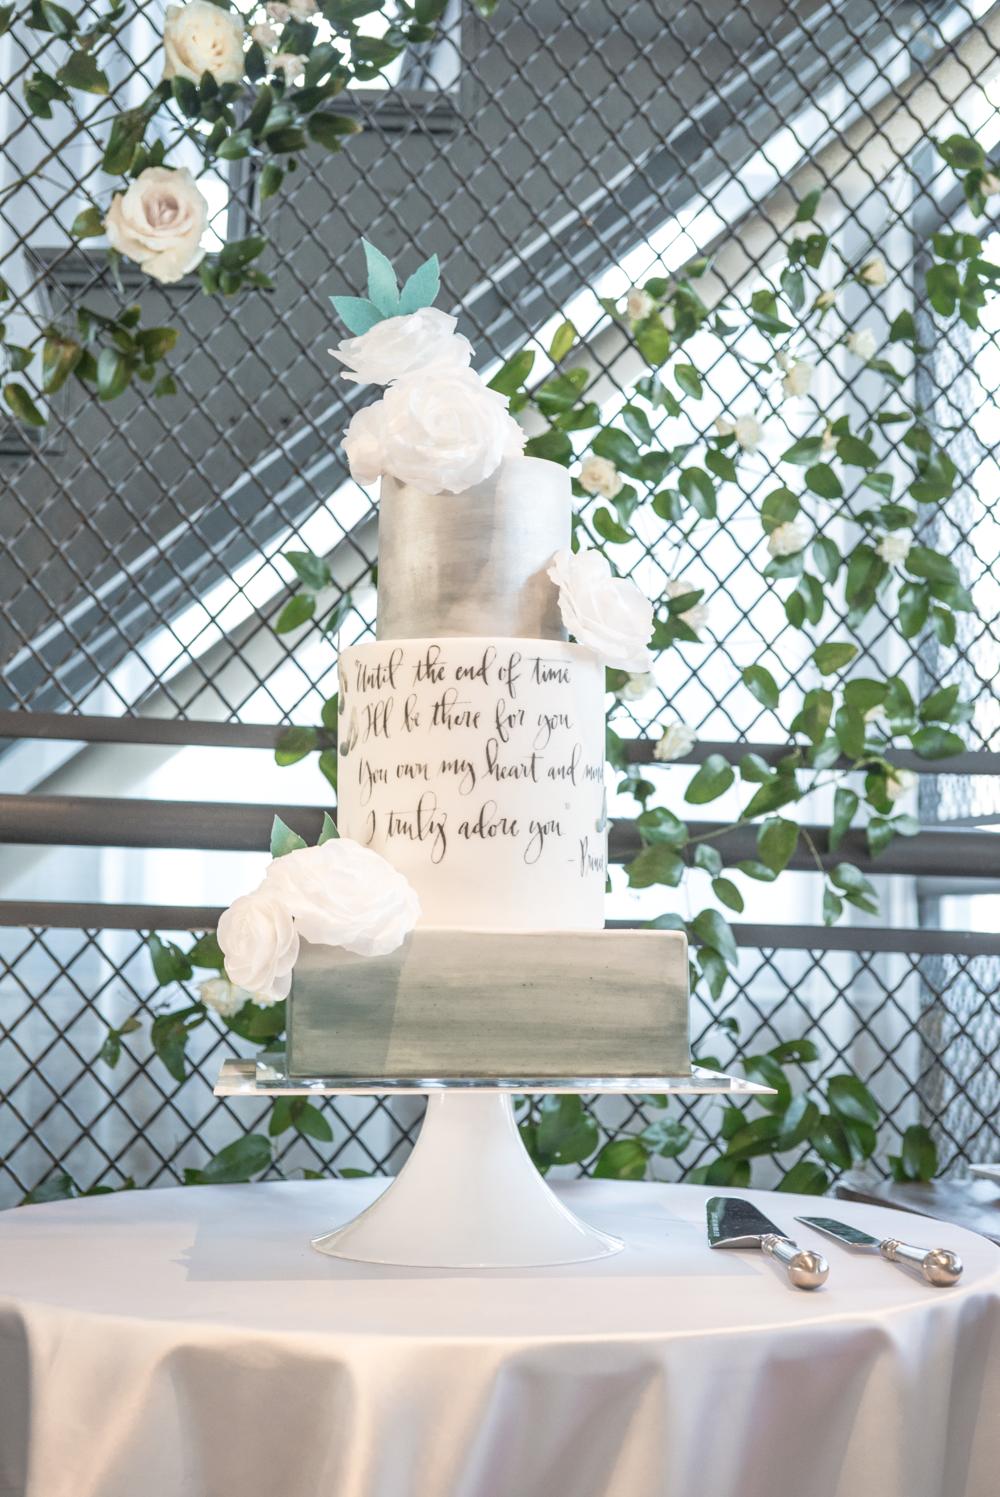 Umhoefer Cake.jpg